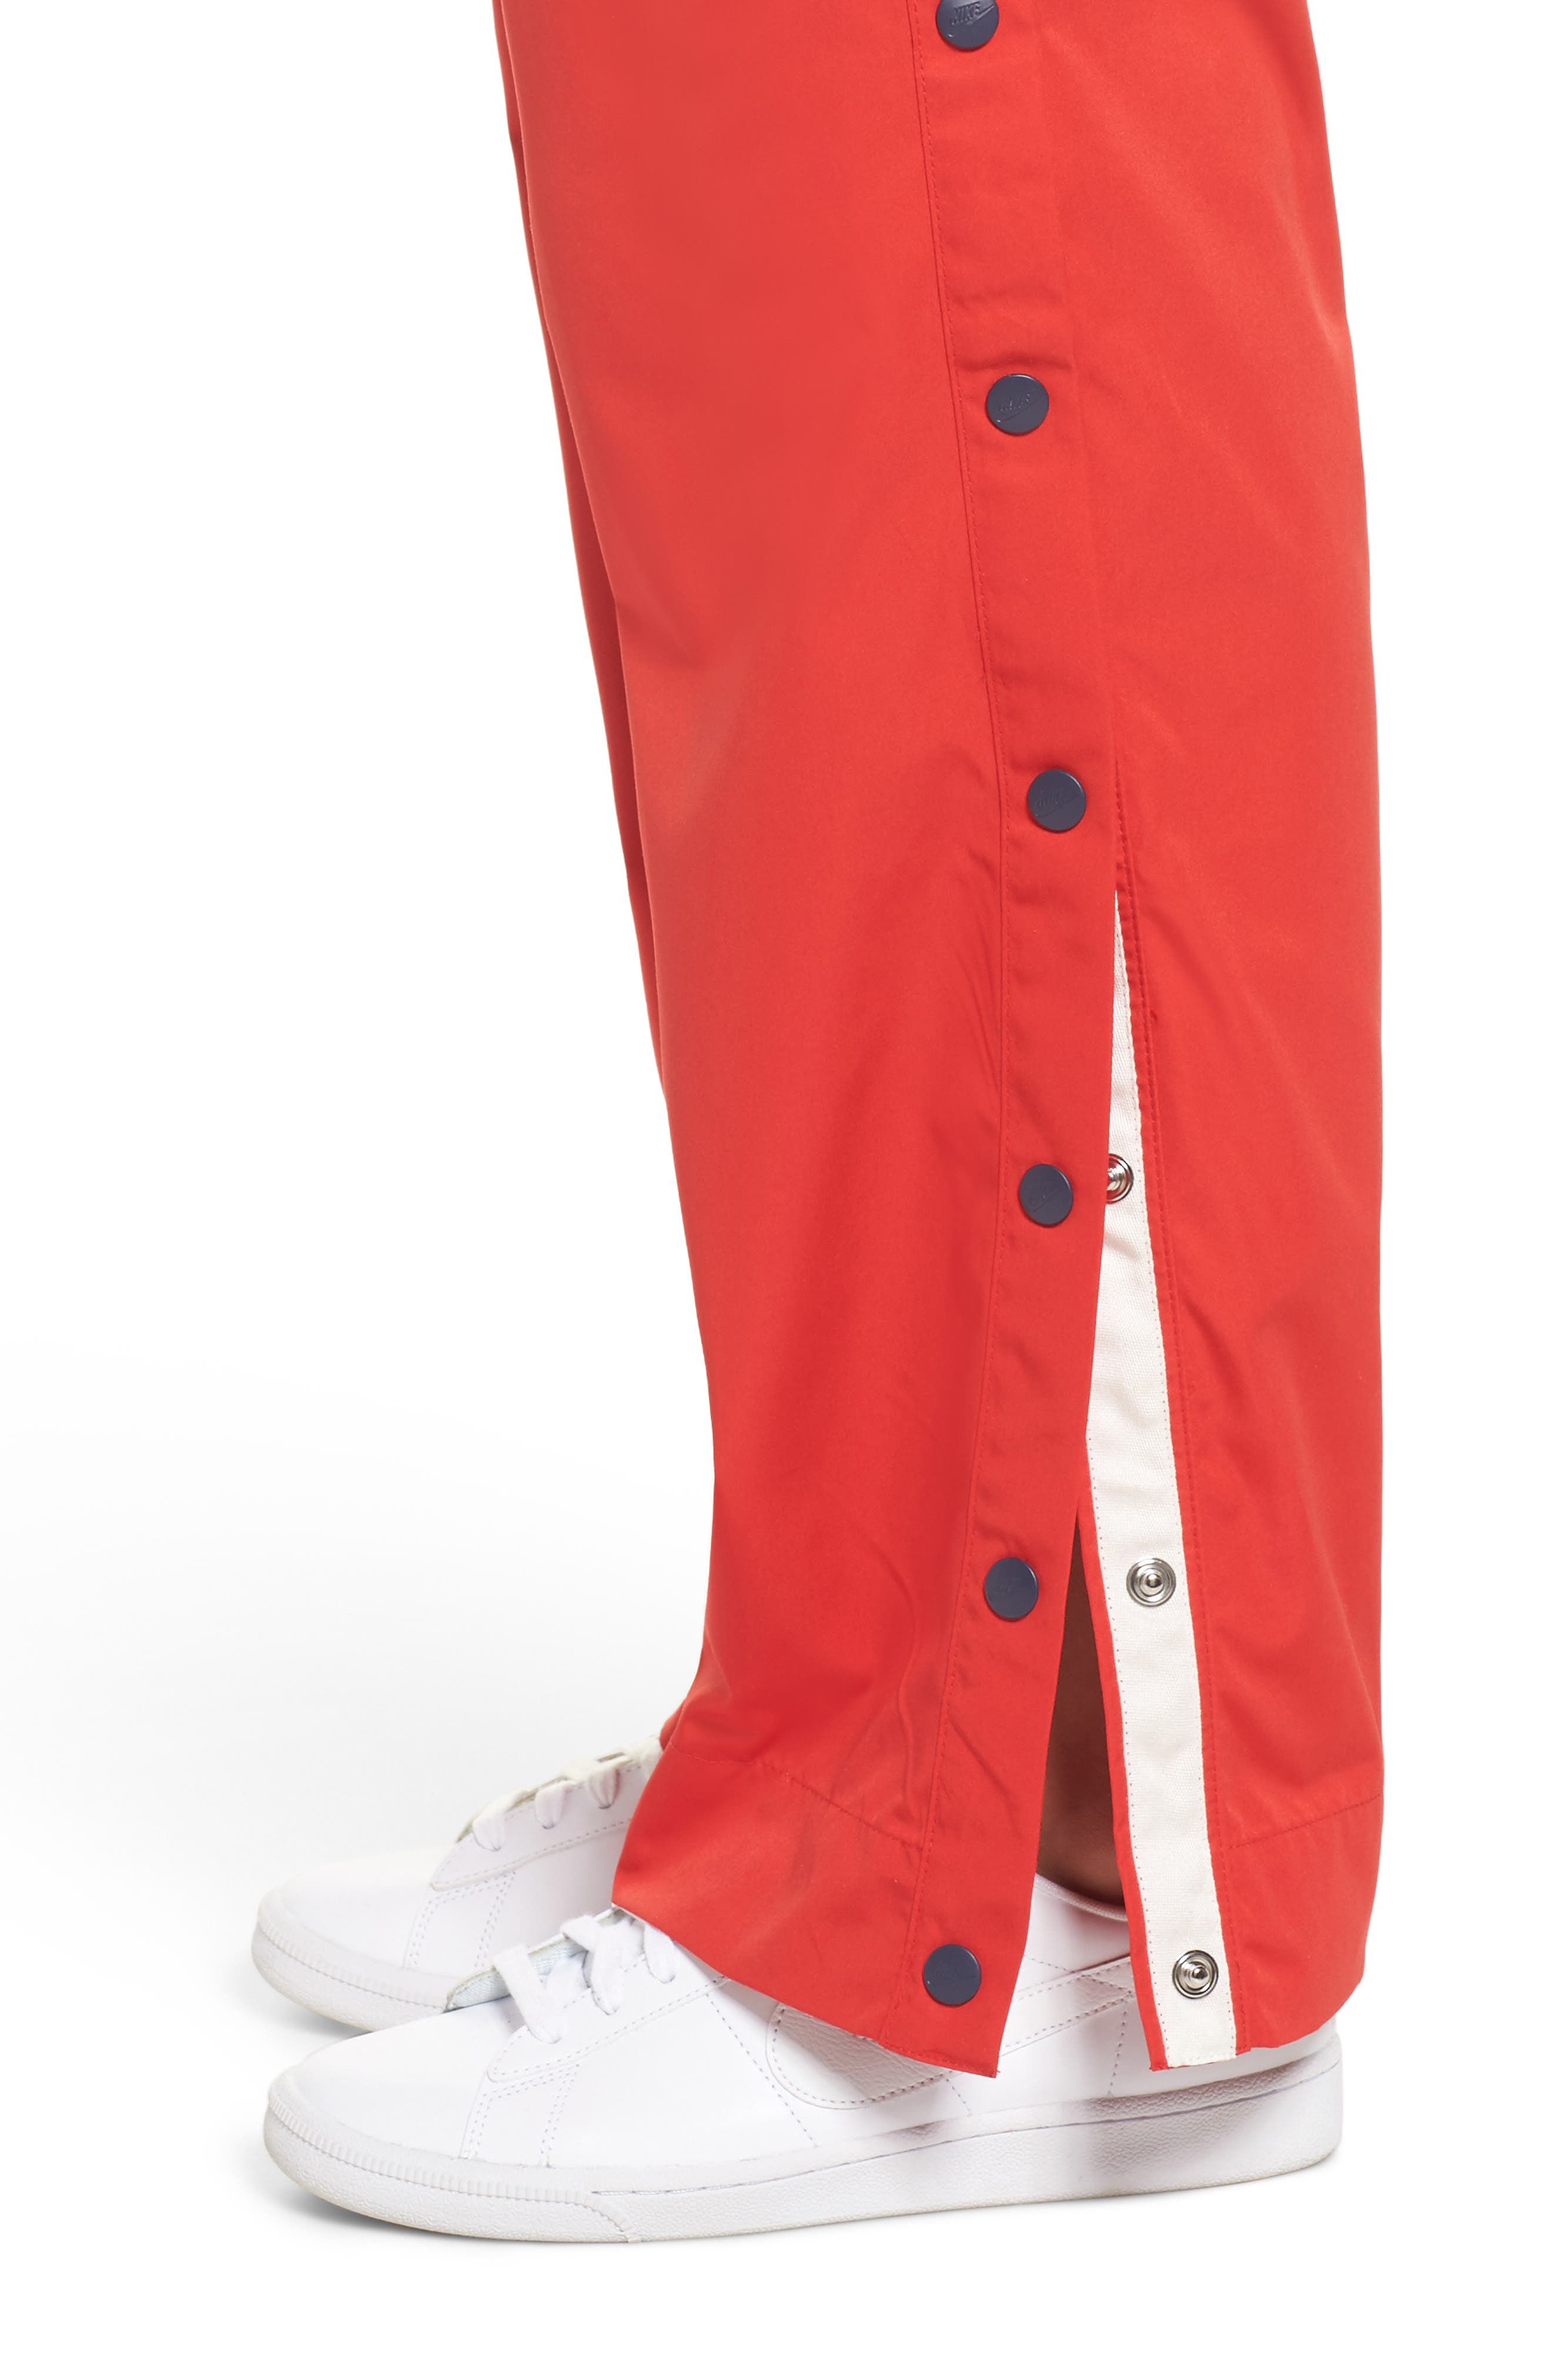 Sportswear Archive Snap Track Pants,                             Alternate thumbnail 6, color,                             University Red/ Thunder Blue